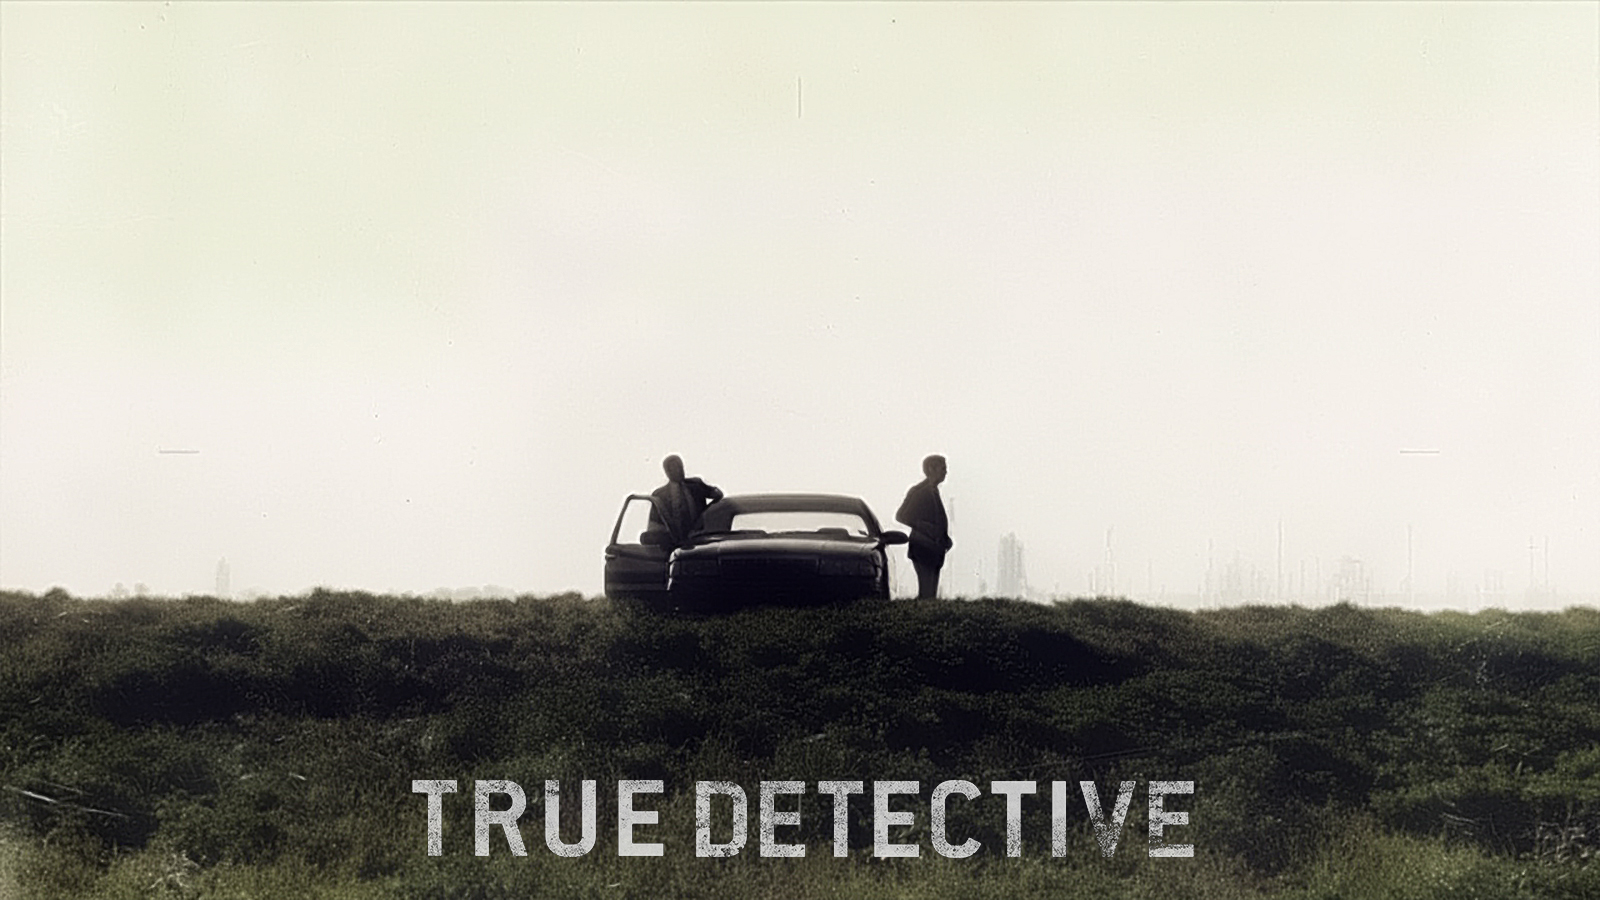 série policière top avis broadchurch true detective narcos sherlock